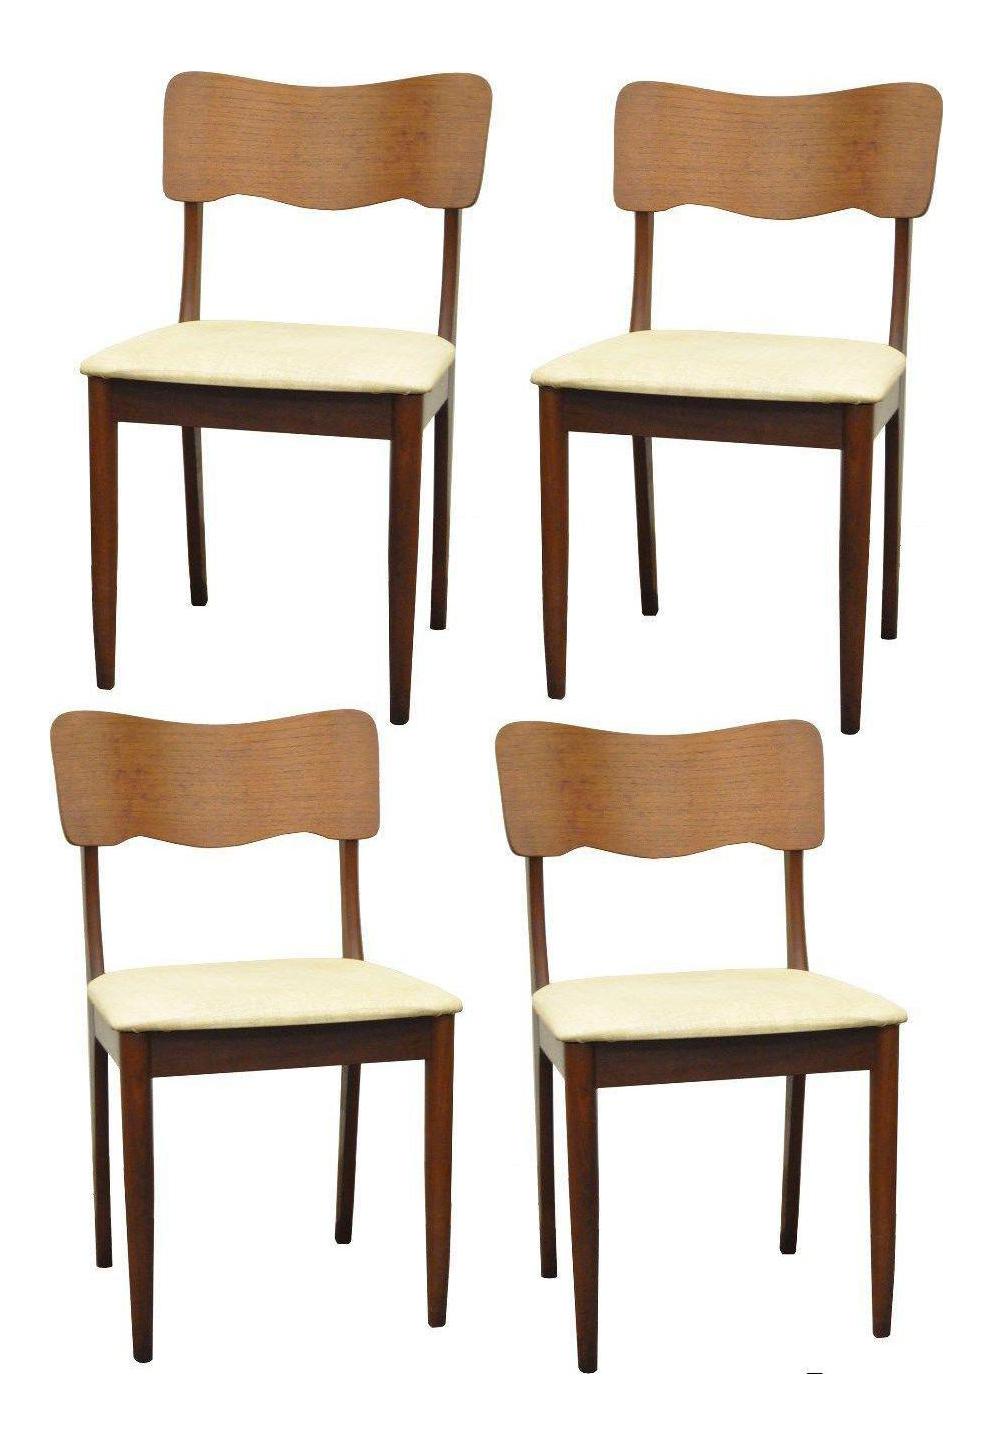 Gustav bahus norway mid century danish modern teak ribbon for Modern dining chairs ireland